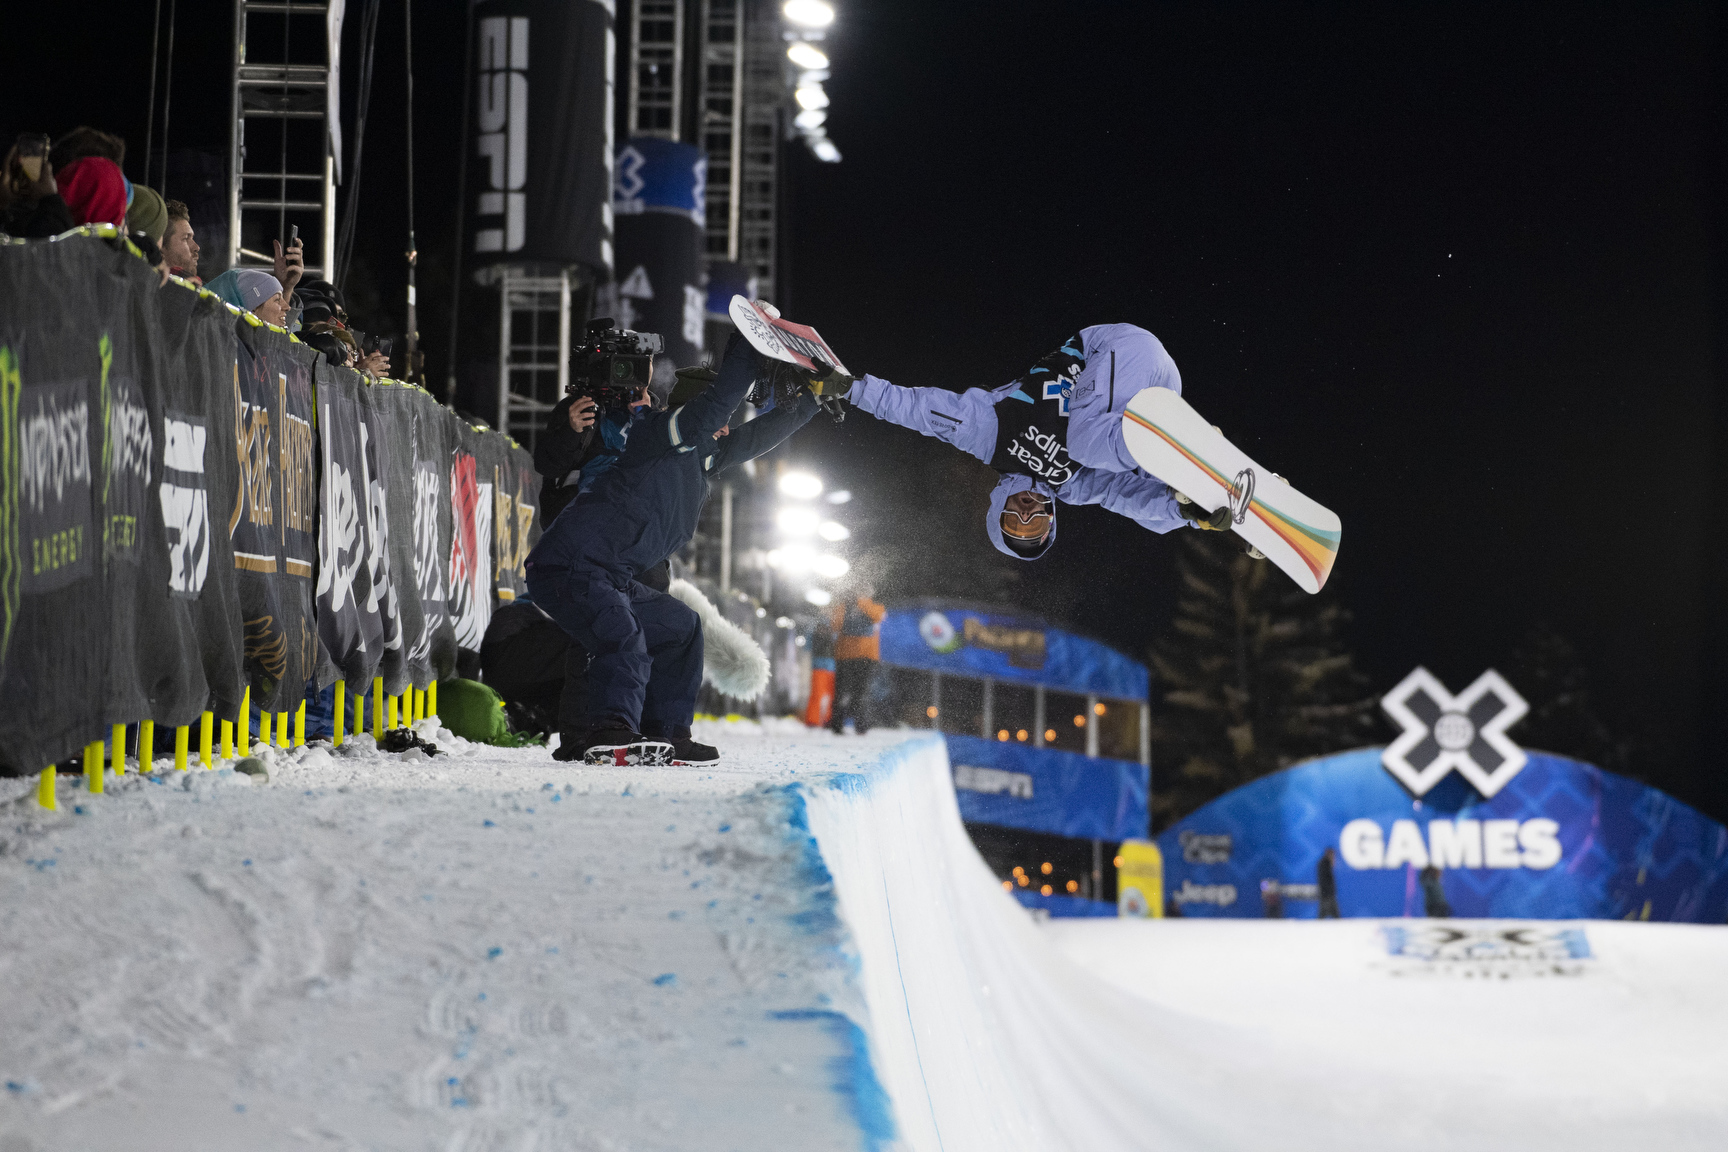 Danny Davis, Snowboard Superpipe Session